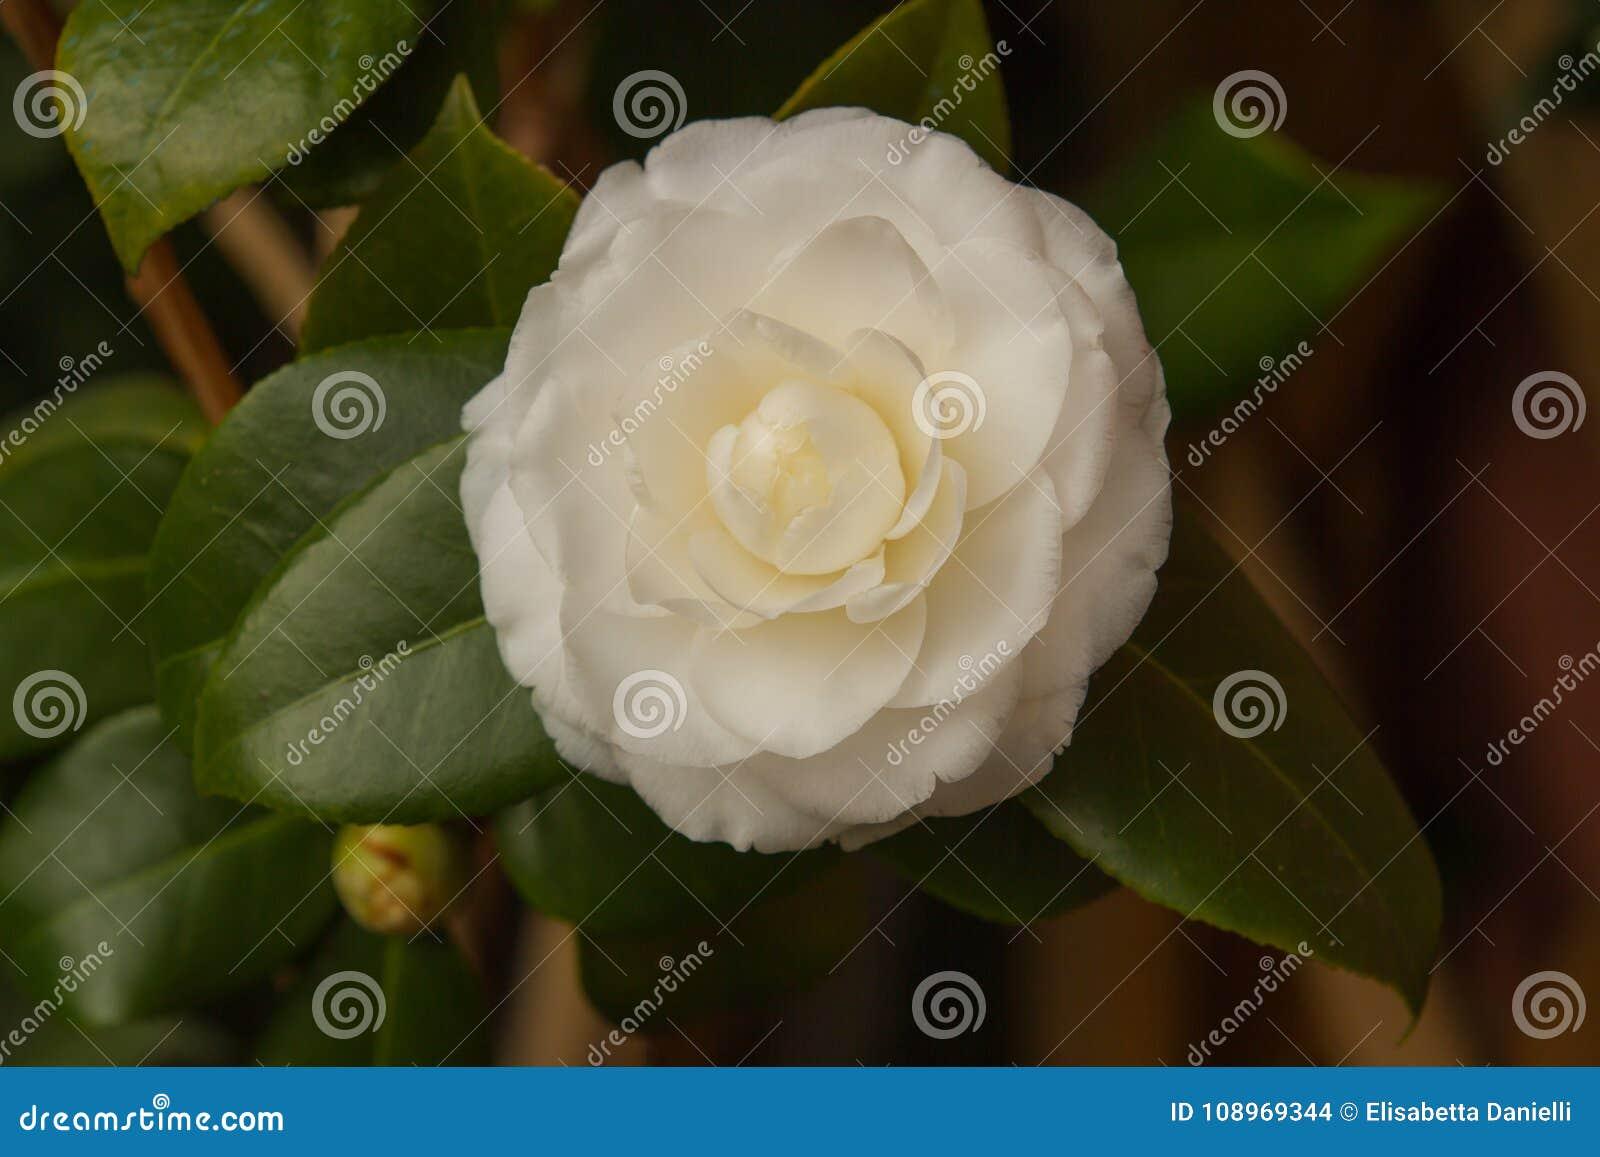 Camellia White Flower In Blossom Stock Photo Image Of Spring